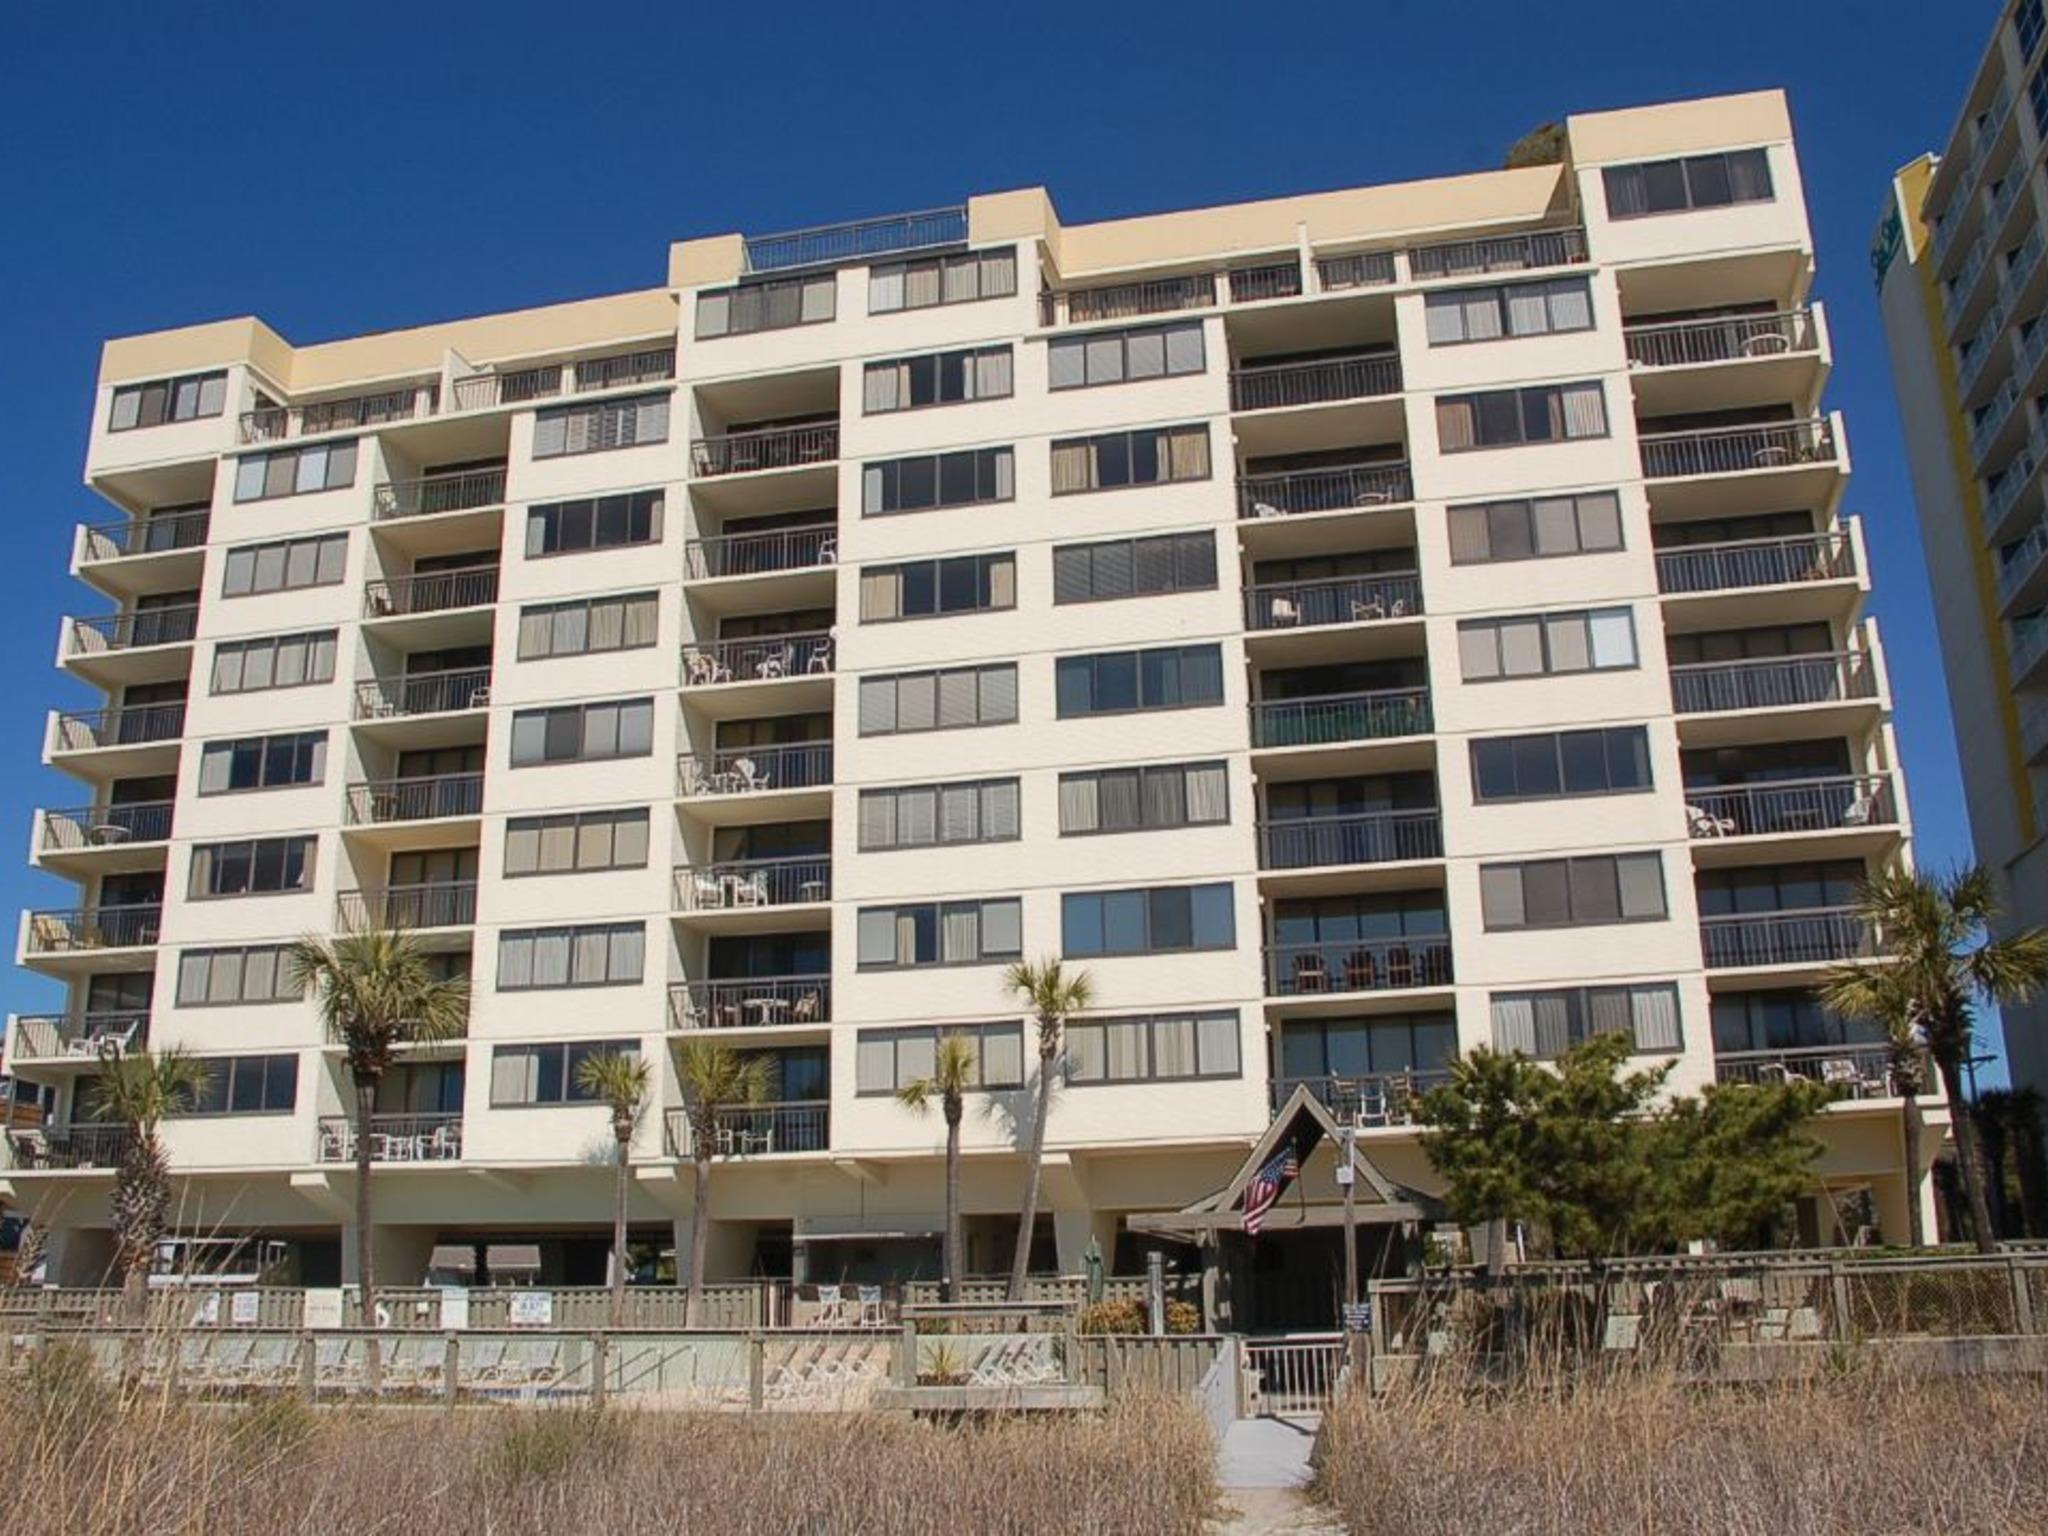 Building High Rise Hotel City Balcony